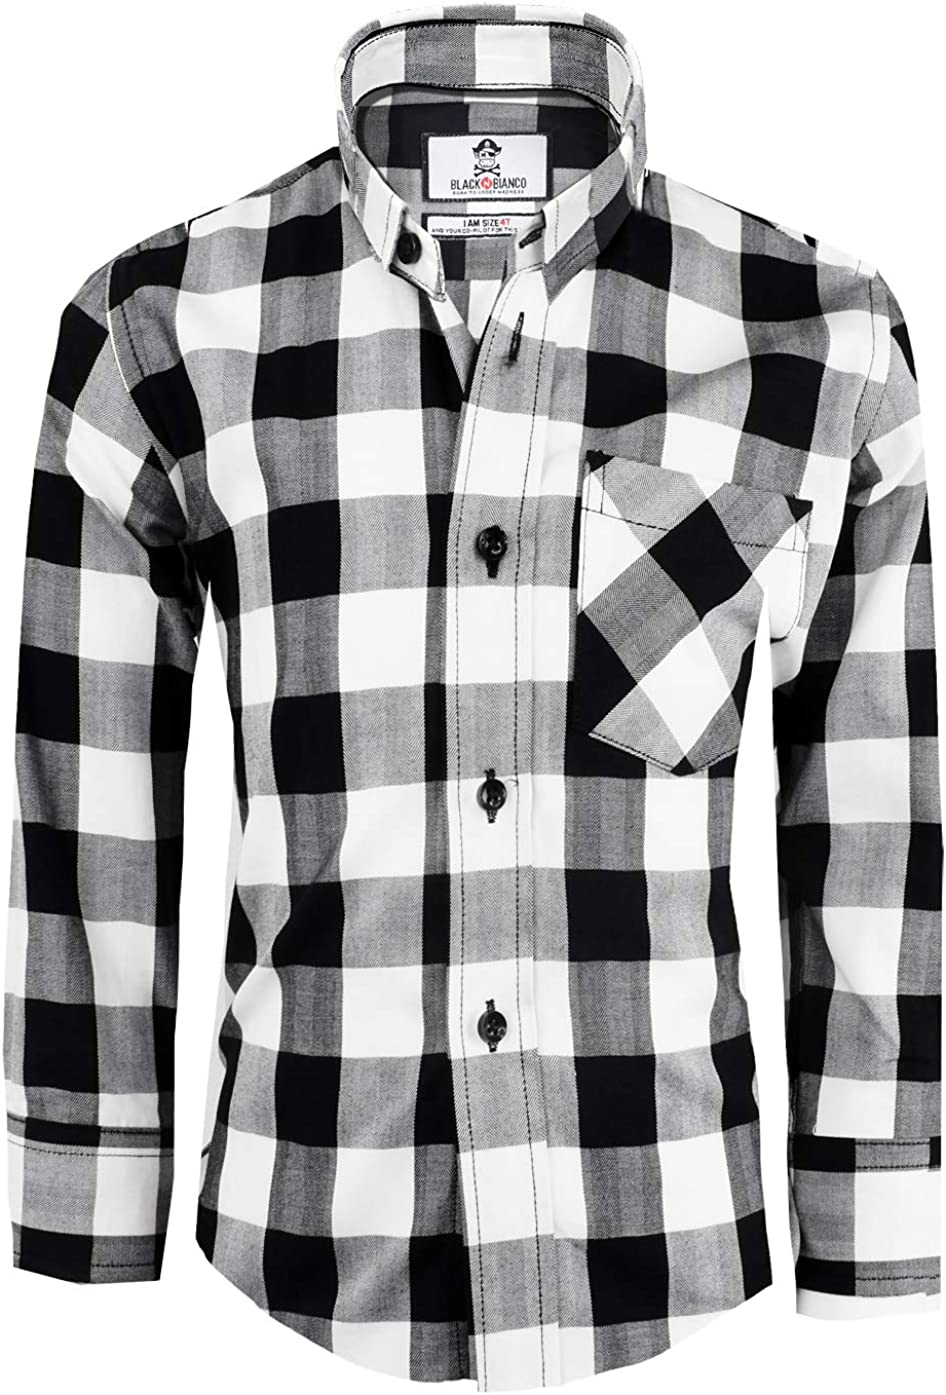 Black n Bianco Boys' Checkered Plaid Button Down Dress Shirts Presented by The Black Ring Pirates